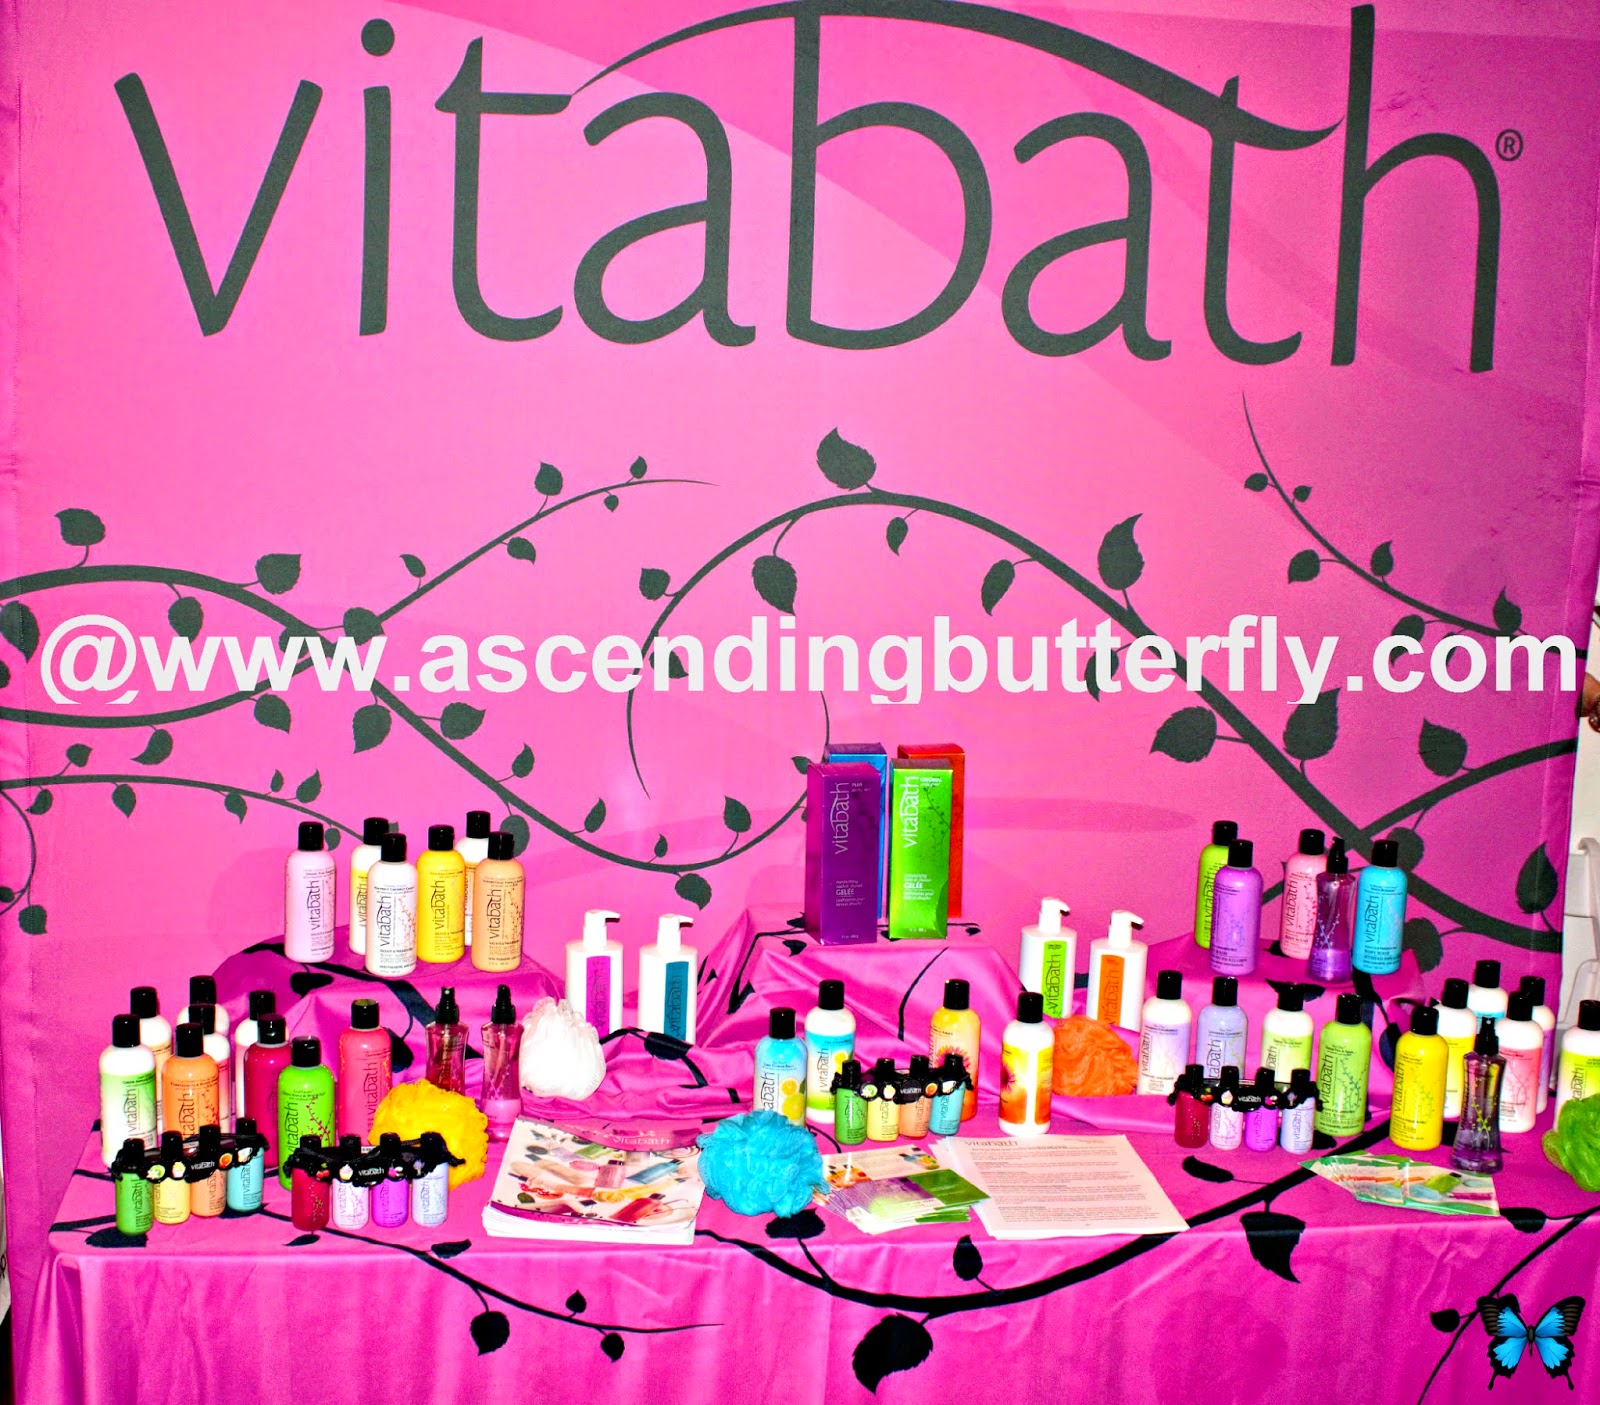 Vitabath at Getting Gorgeous 2014